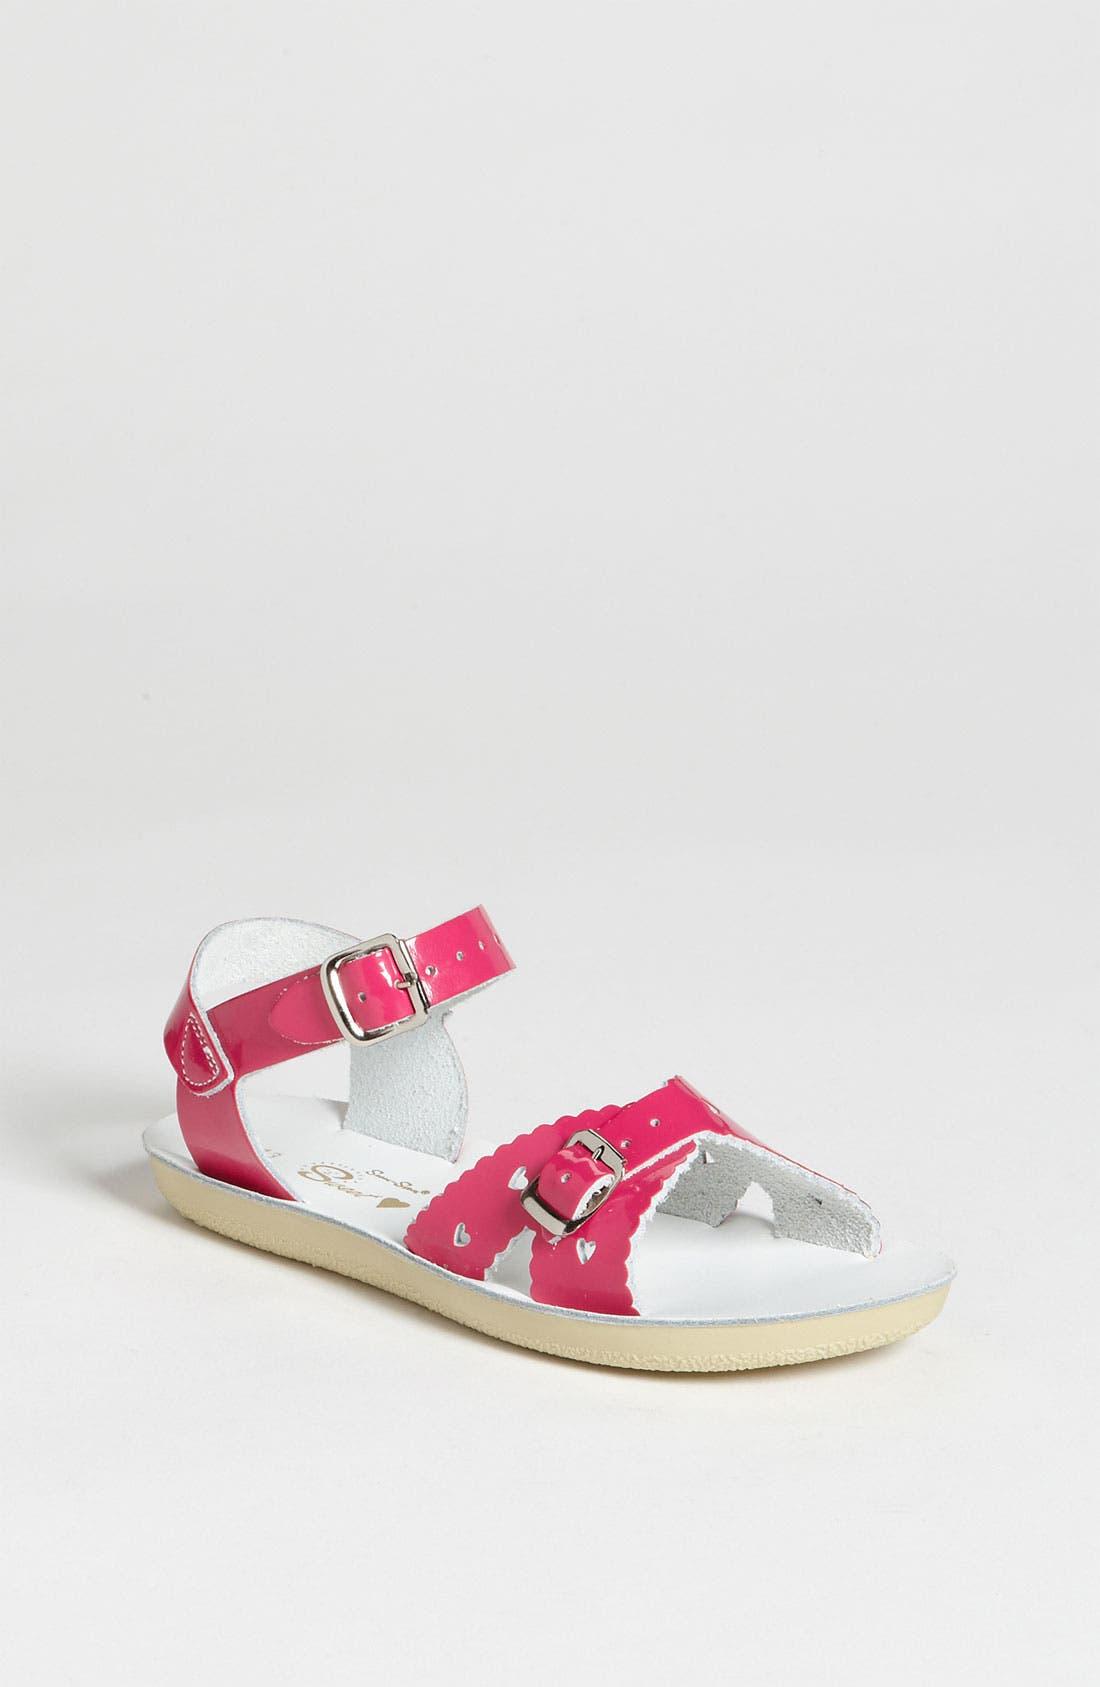 Alternate Image 1 Selected - Salt Water Sandals by Hoy 'Sweetheart' Sandal (Walker, Toddler & Little Kid)